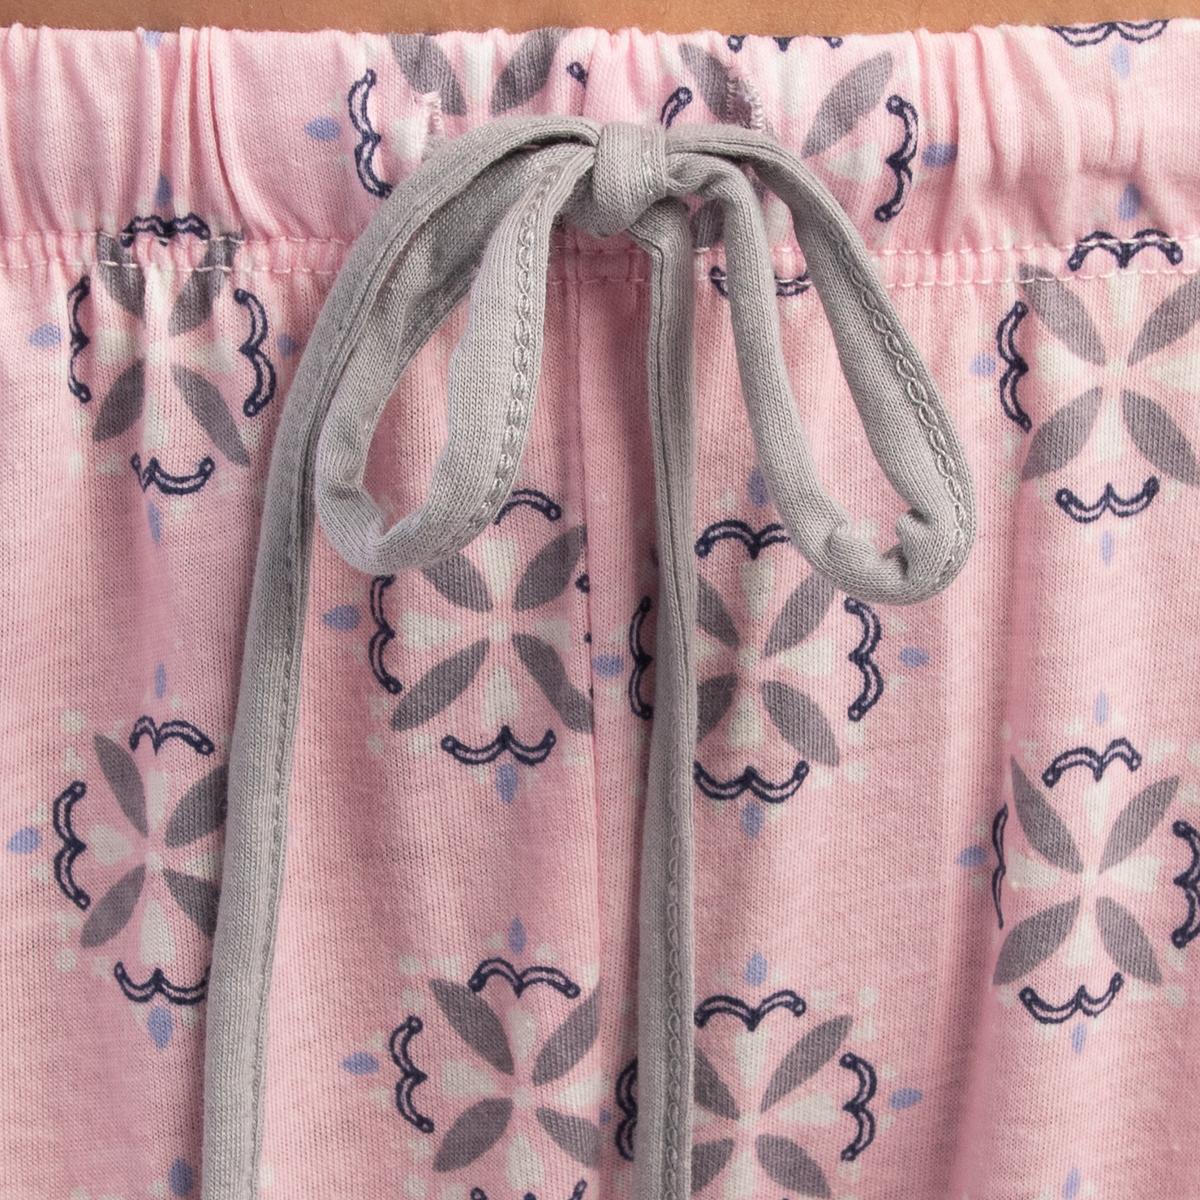 2-Piece-Jockey-Cotton-Pajamas-For-Women-Set-Long-Sleeve-Top-Bottom-PJs-Sleepwear thumbnail 9